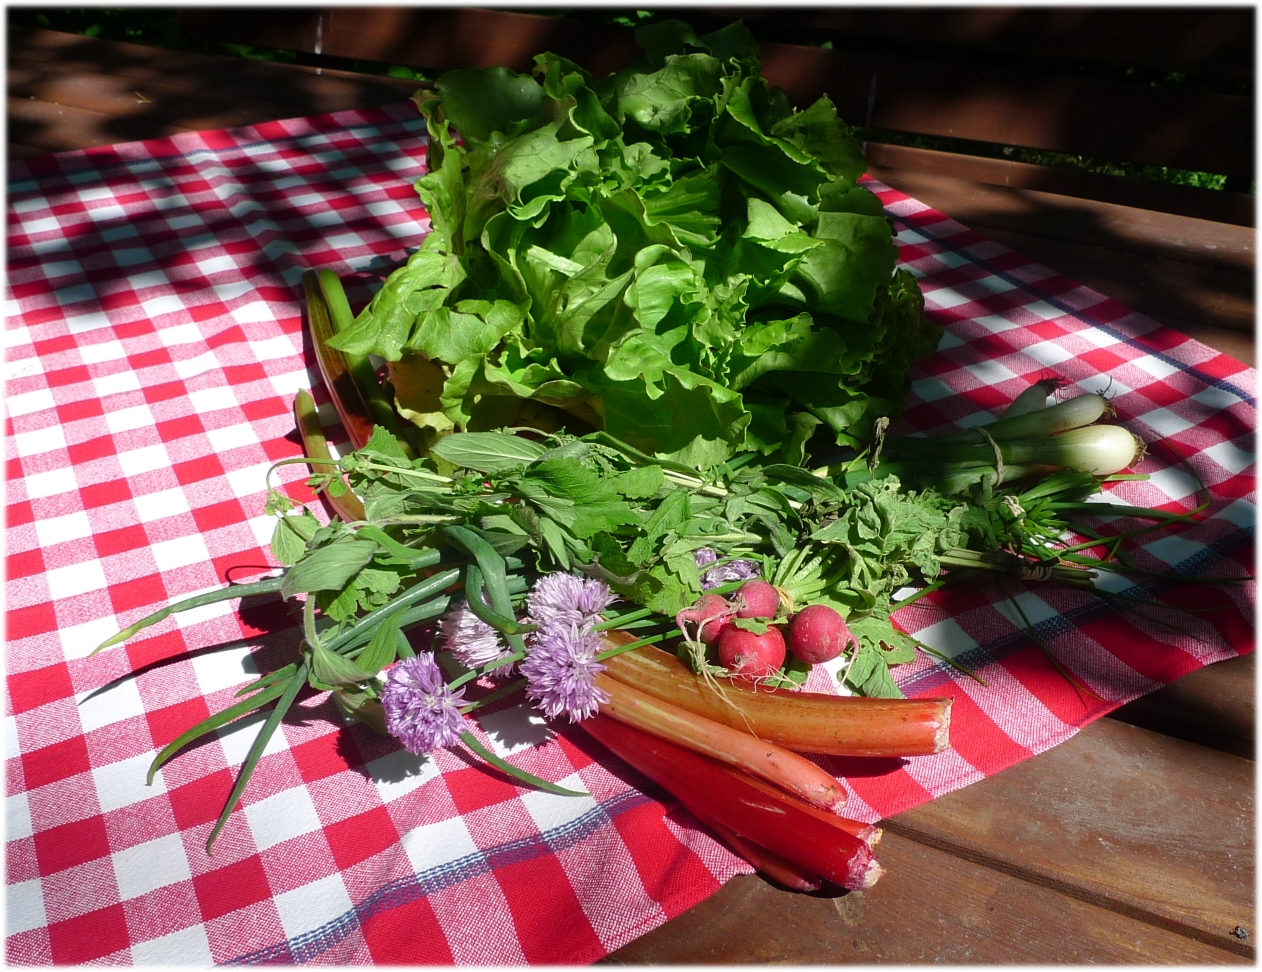 salaatinkerä, raparperiä, retiisejä, sipulia, ruohosipulia, yrttejä